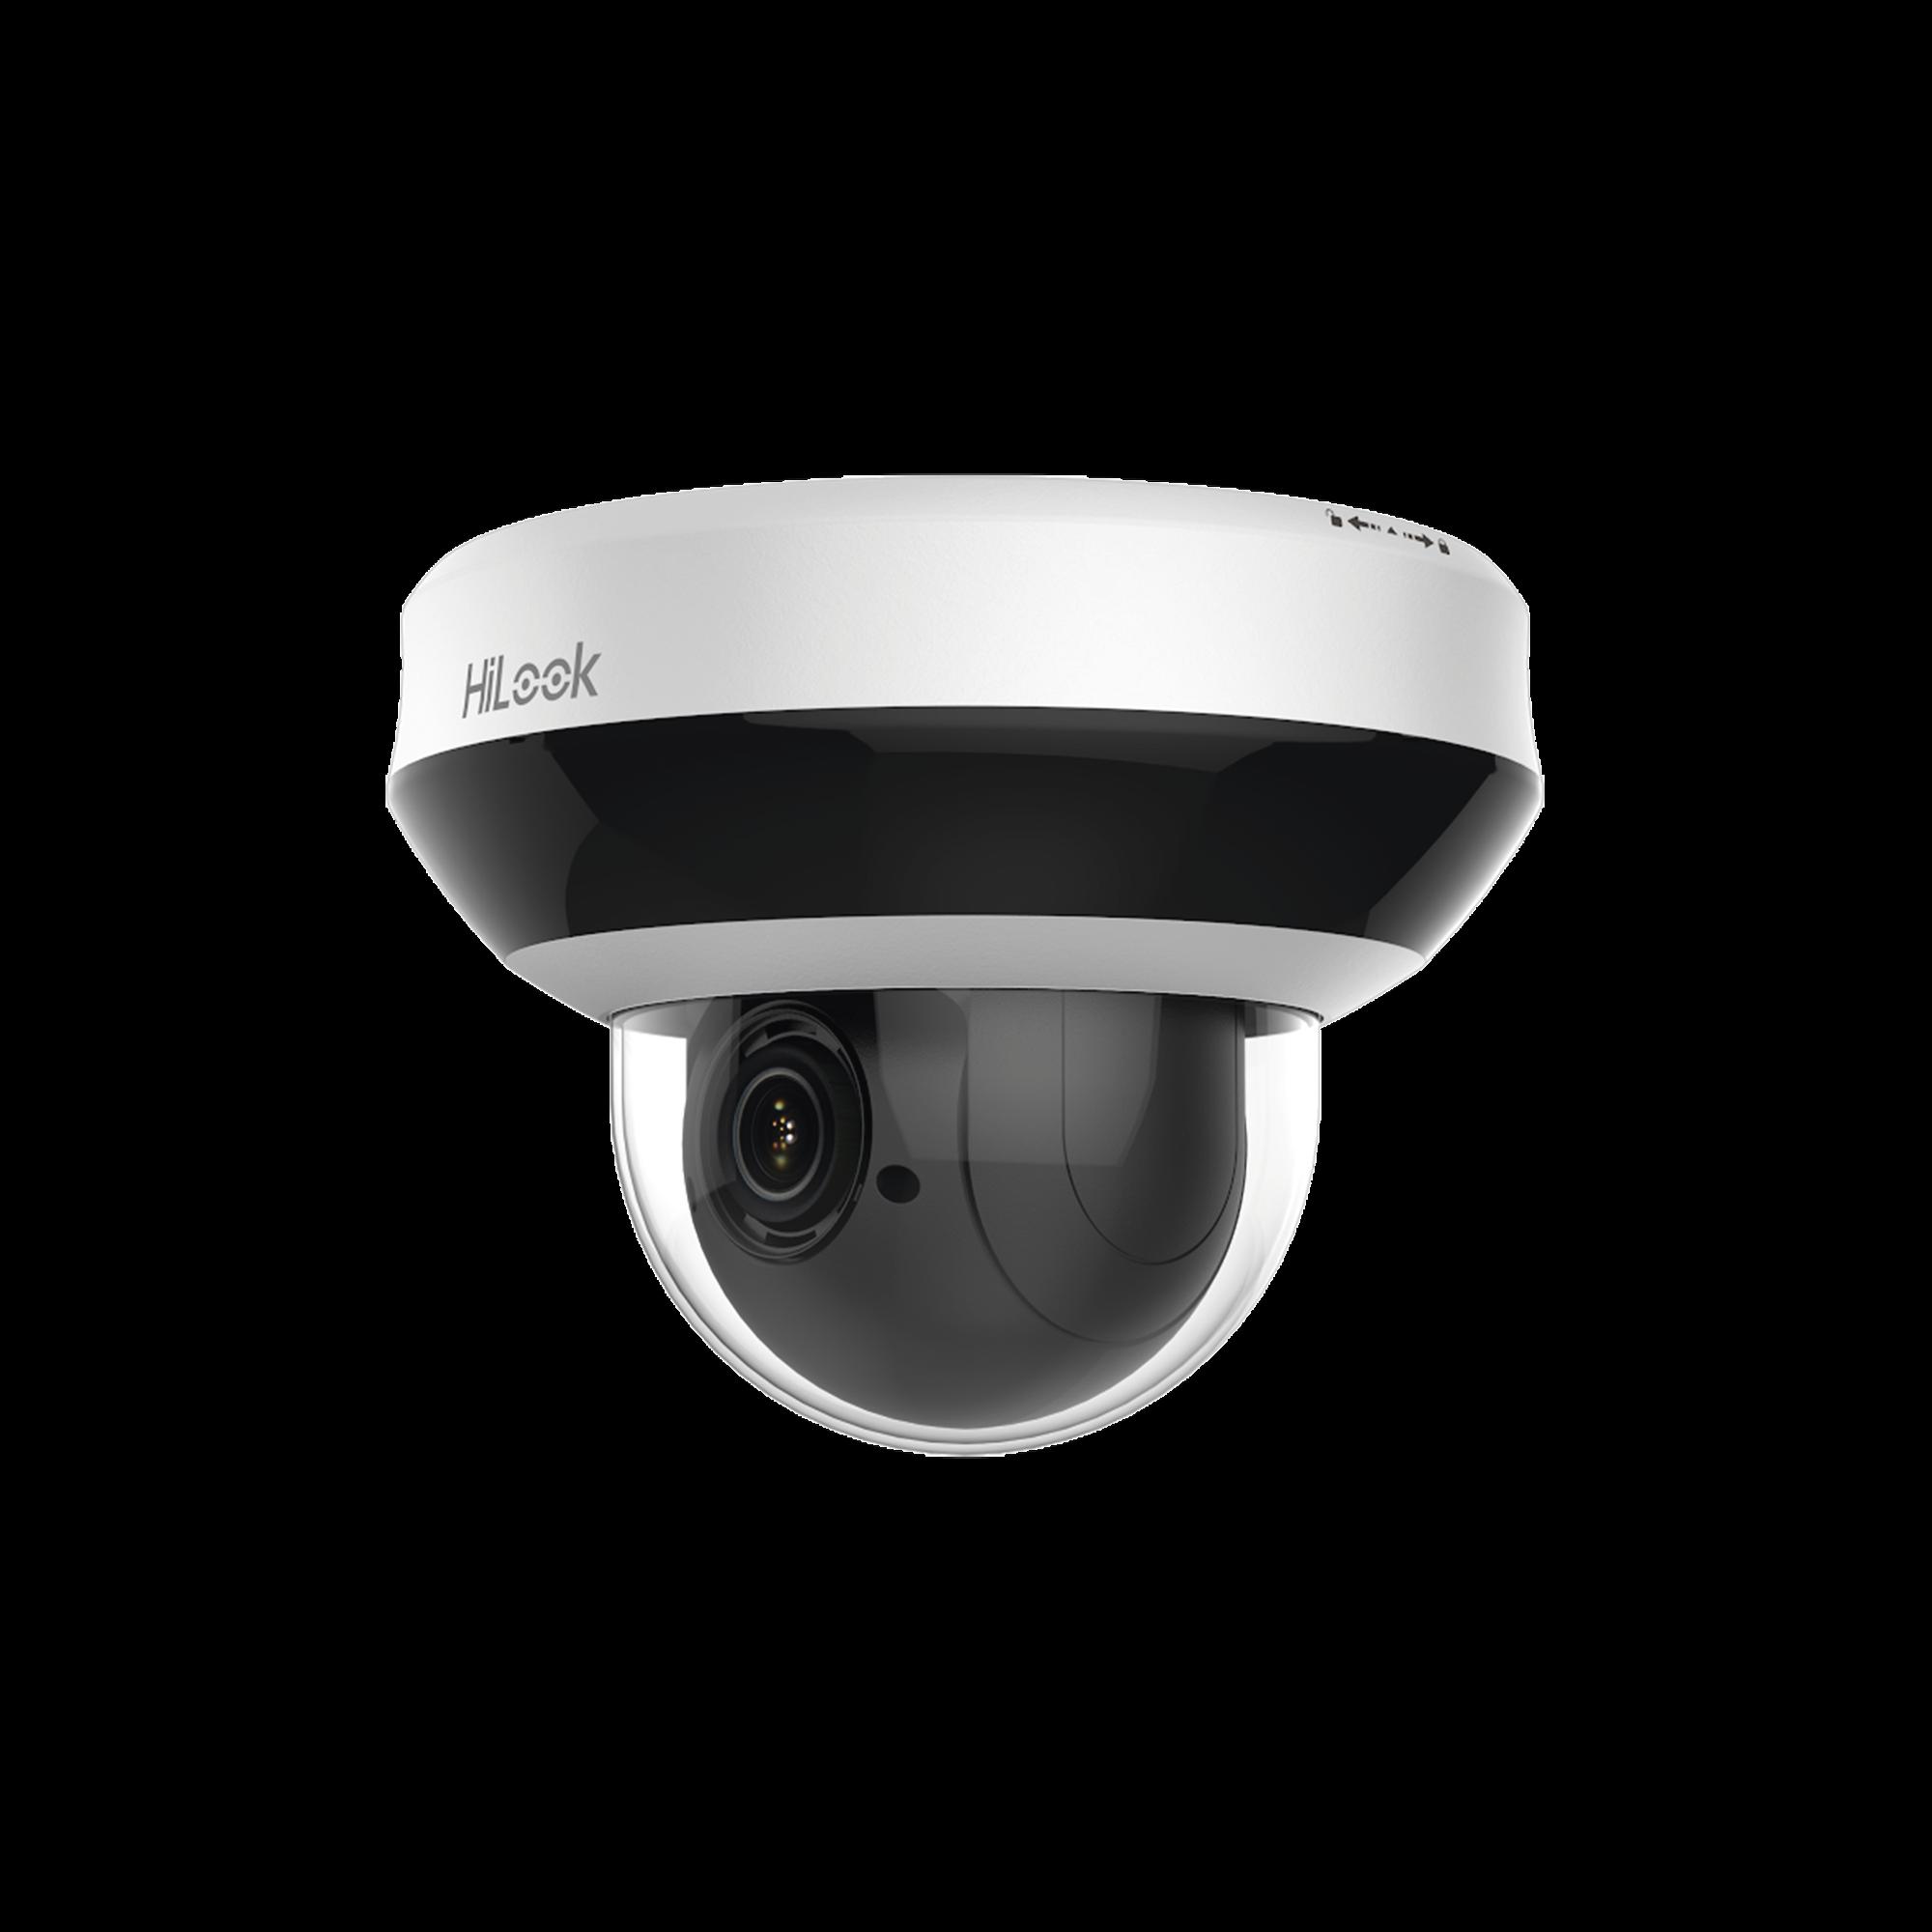 Mini PTZ IP 4 Megapixel / 4X Zoom / H.265+ / 20 mts IR EXIR / WDR / PoE / IK10 / Exterior IP66 / Ultra Baja Iluminación / Micrófono Integrado / PoE